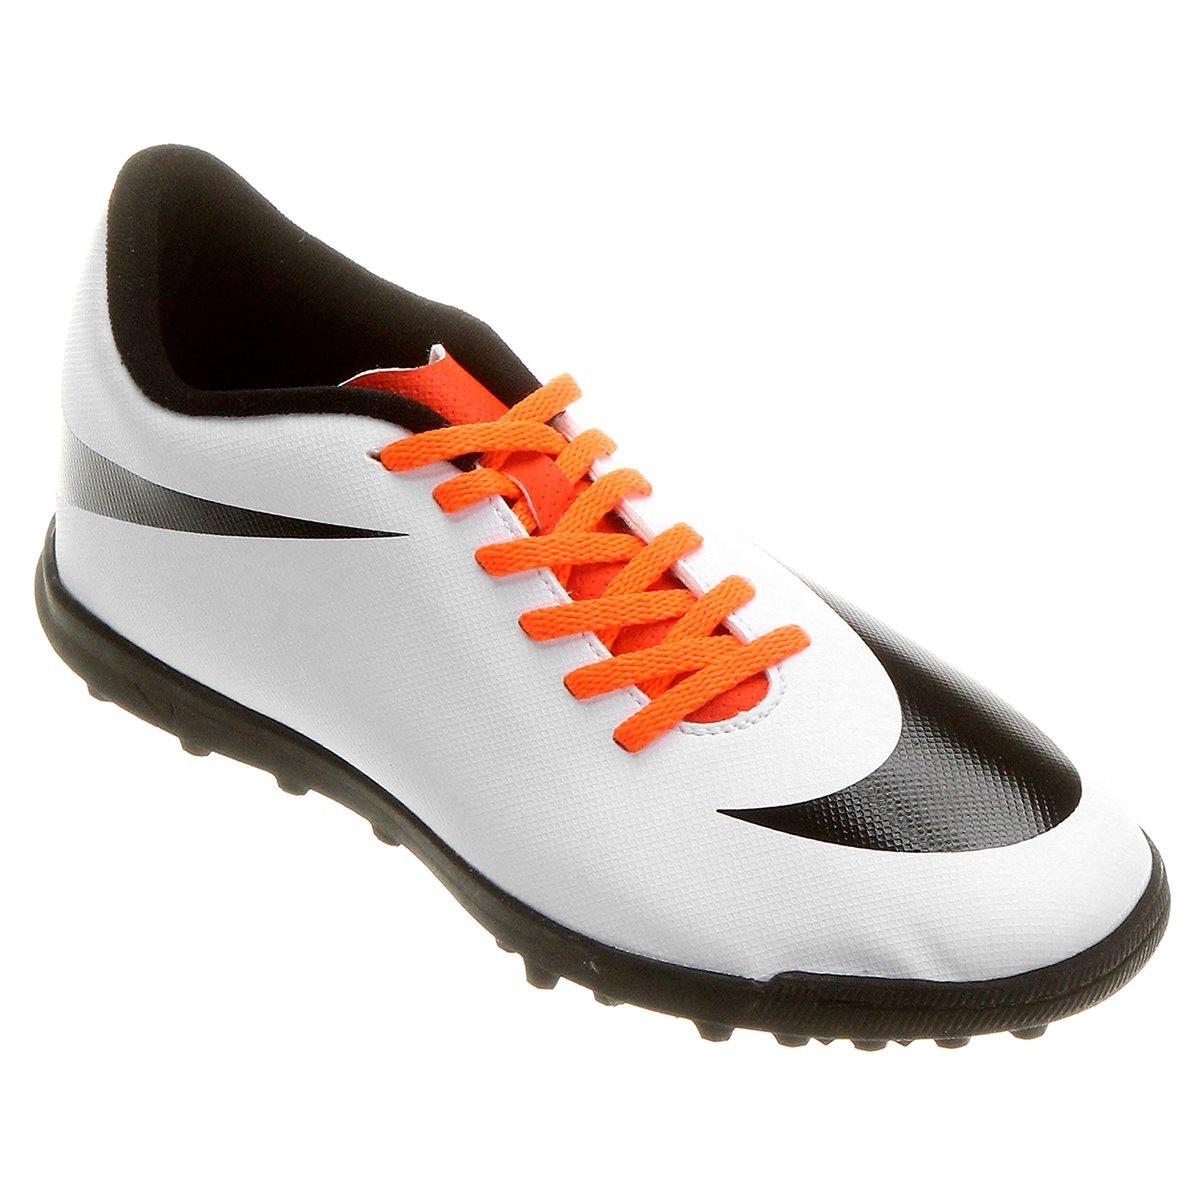 1625b0f9e008a Chuteira Society Nike Bravata TF | Shop Timão